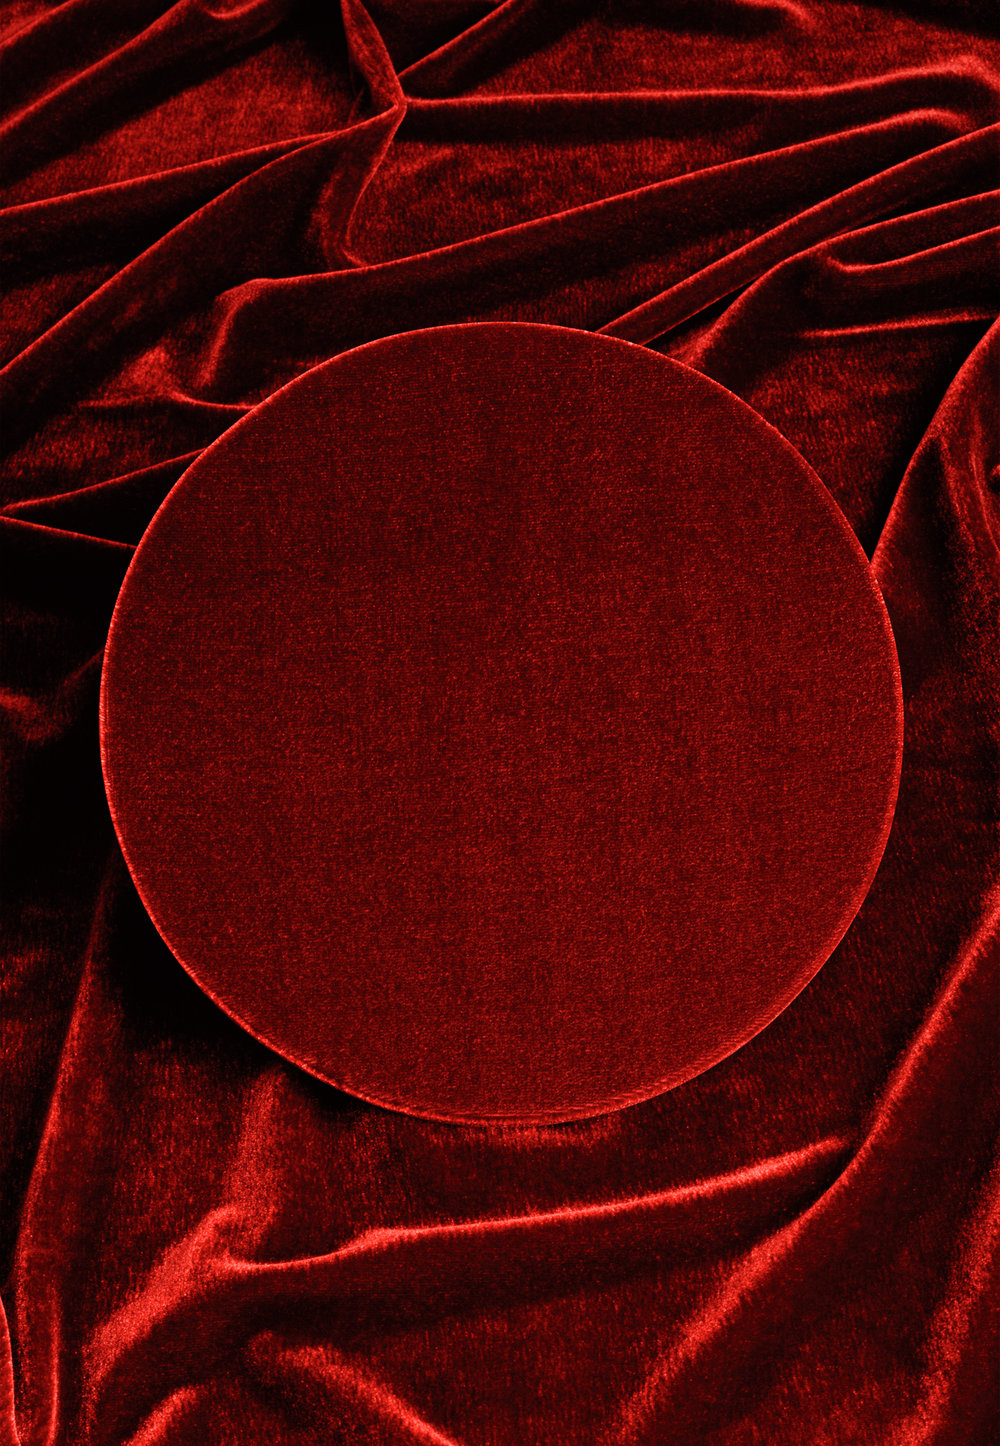 Red circle 1, 2016 C-Print, 52,5 x 36 cm